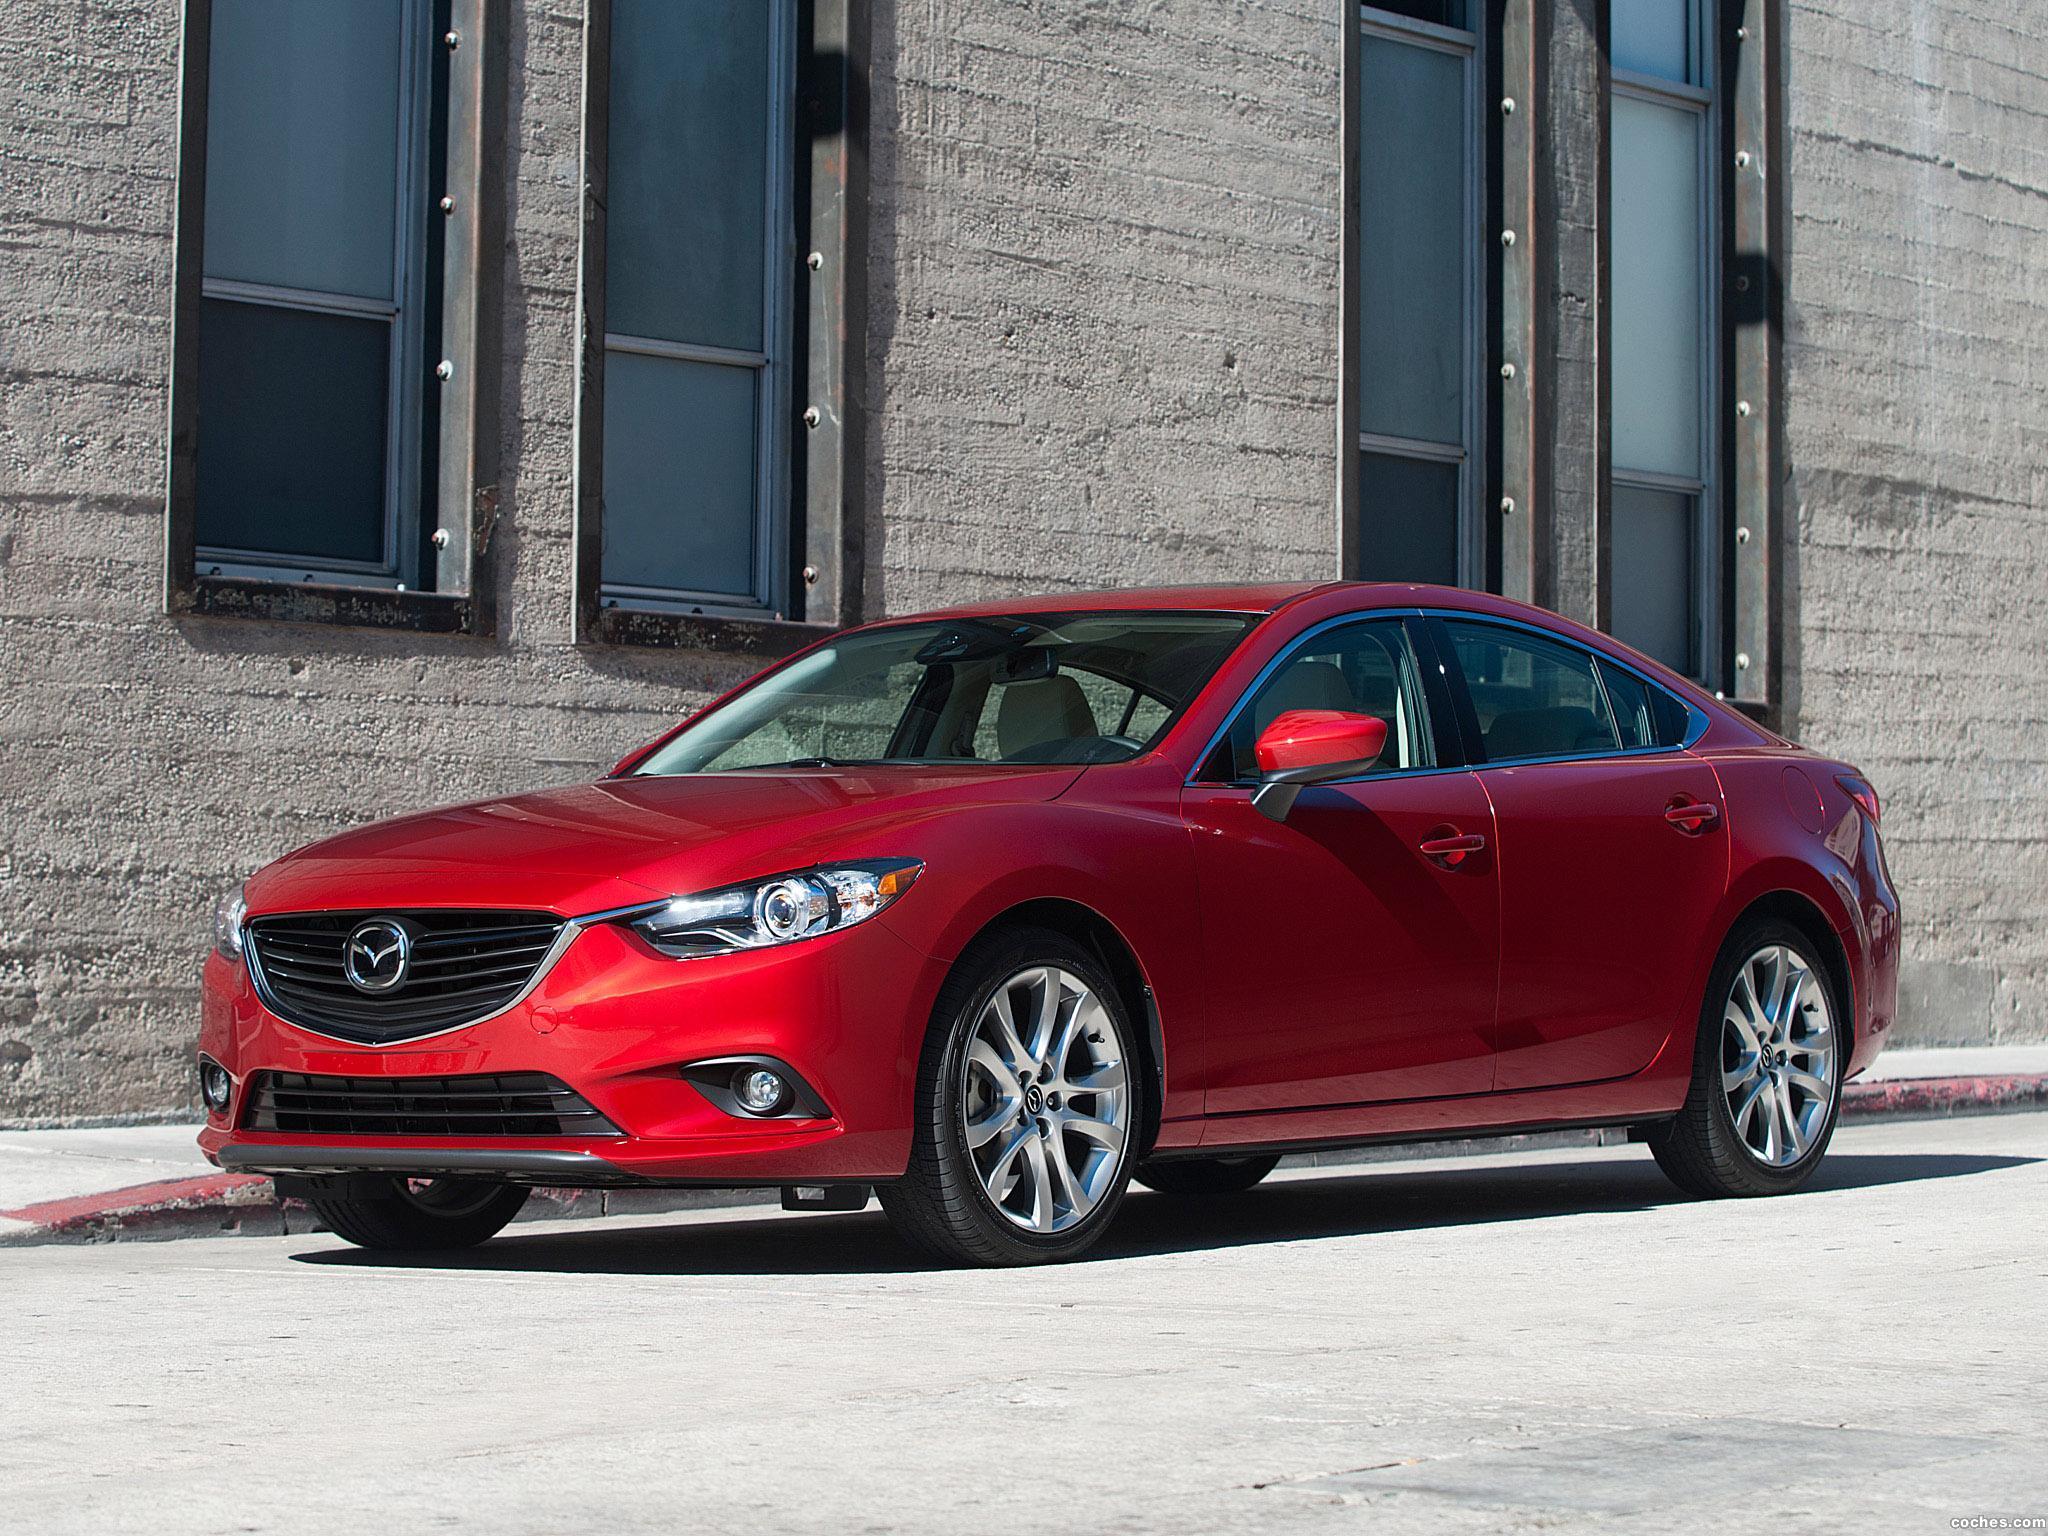 Foto 19 de Mazda 6 USA 2013